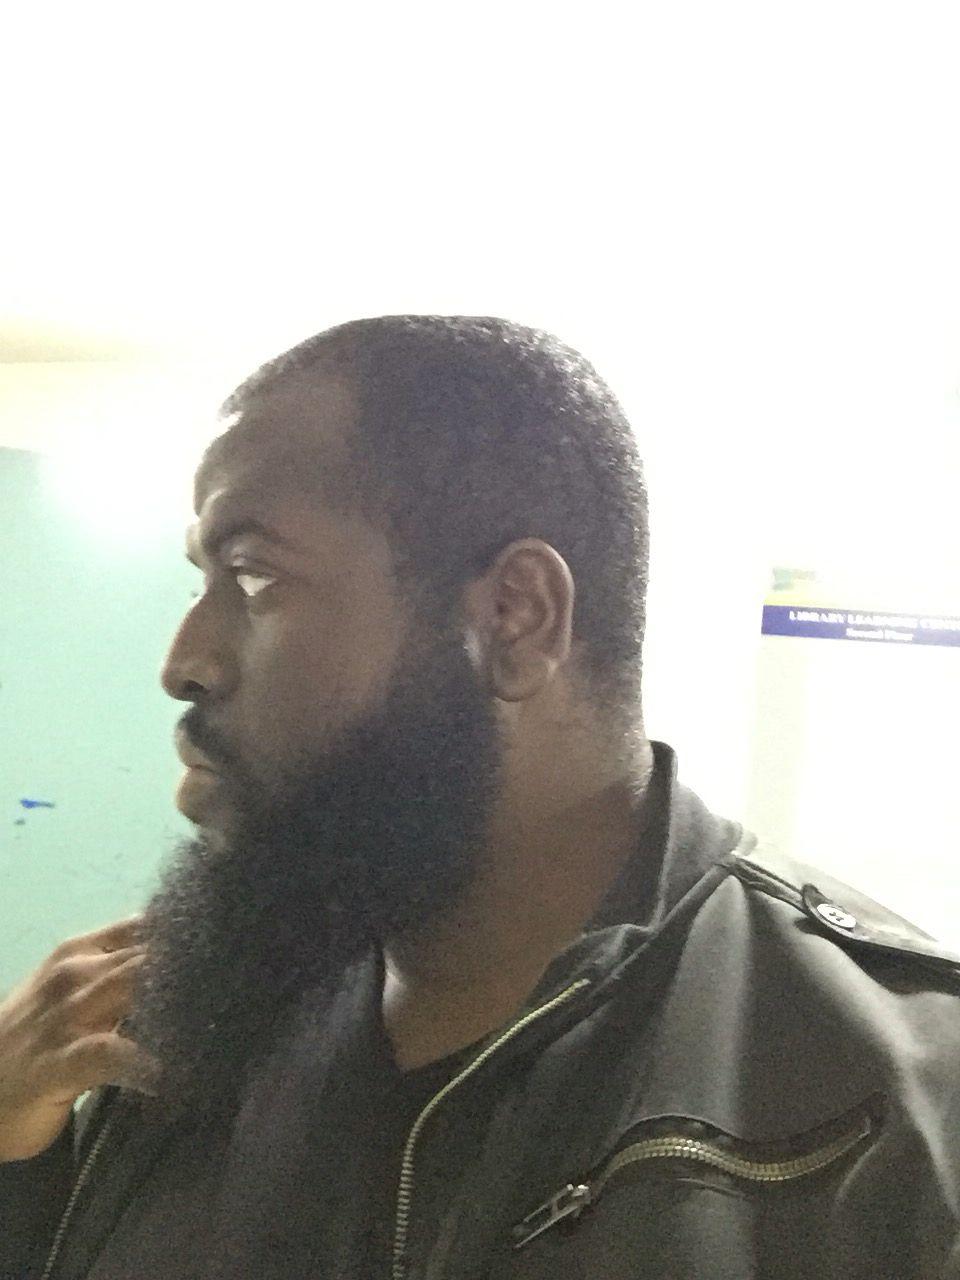 Side view of my beard